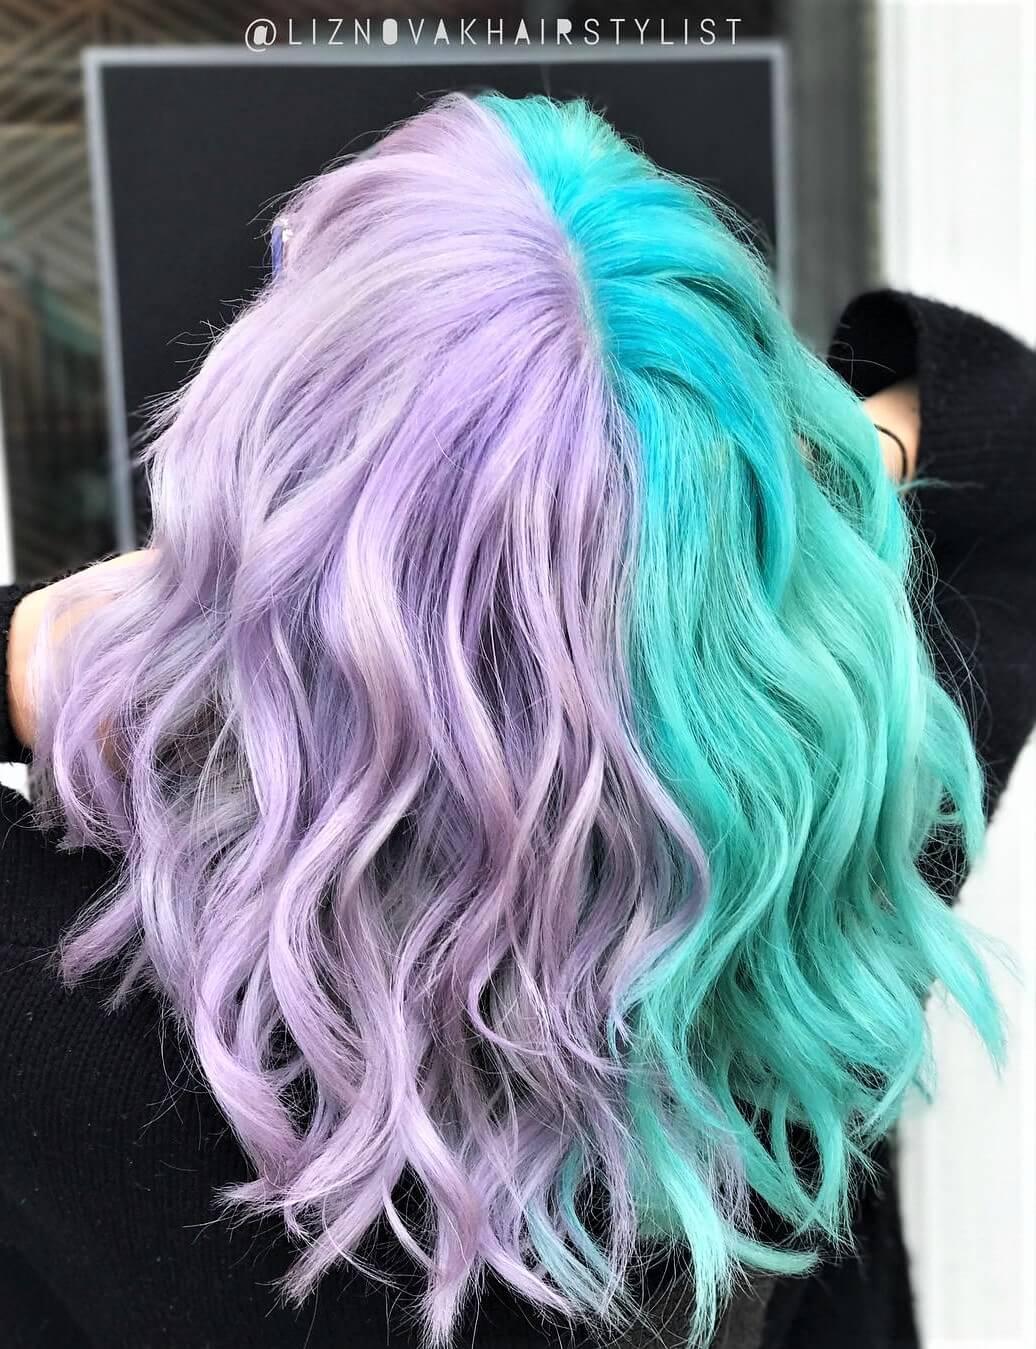 Unicorn hair symmetry styled with very diluted Purple Rain hair dye & Aquamarine dye by liznovakhairstylist